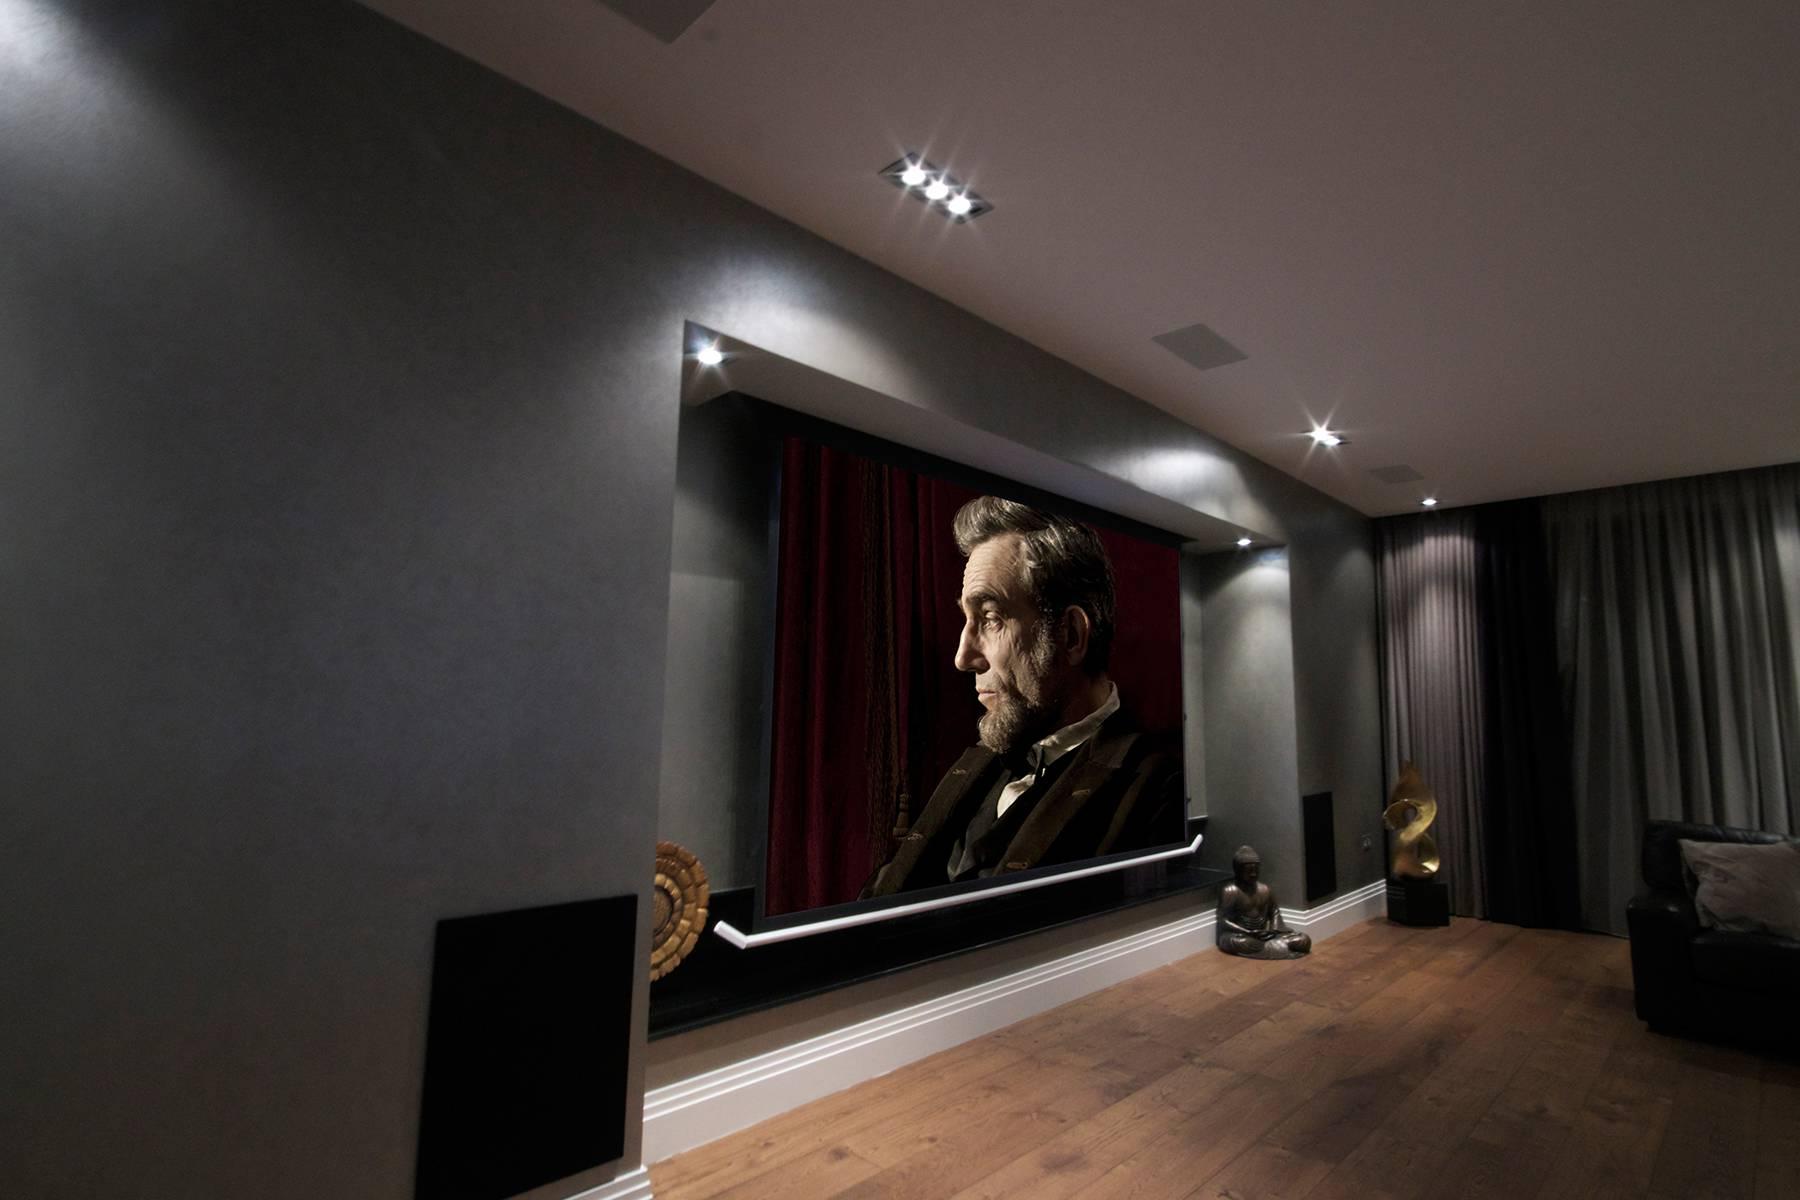 for ceiling patrofi ceilings veloclub speakers surround sound in system speaker co